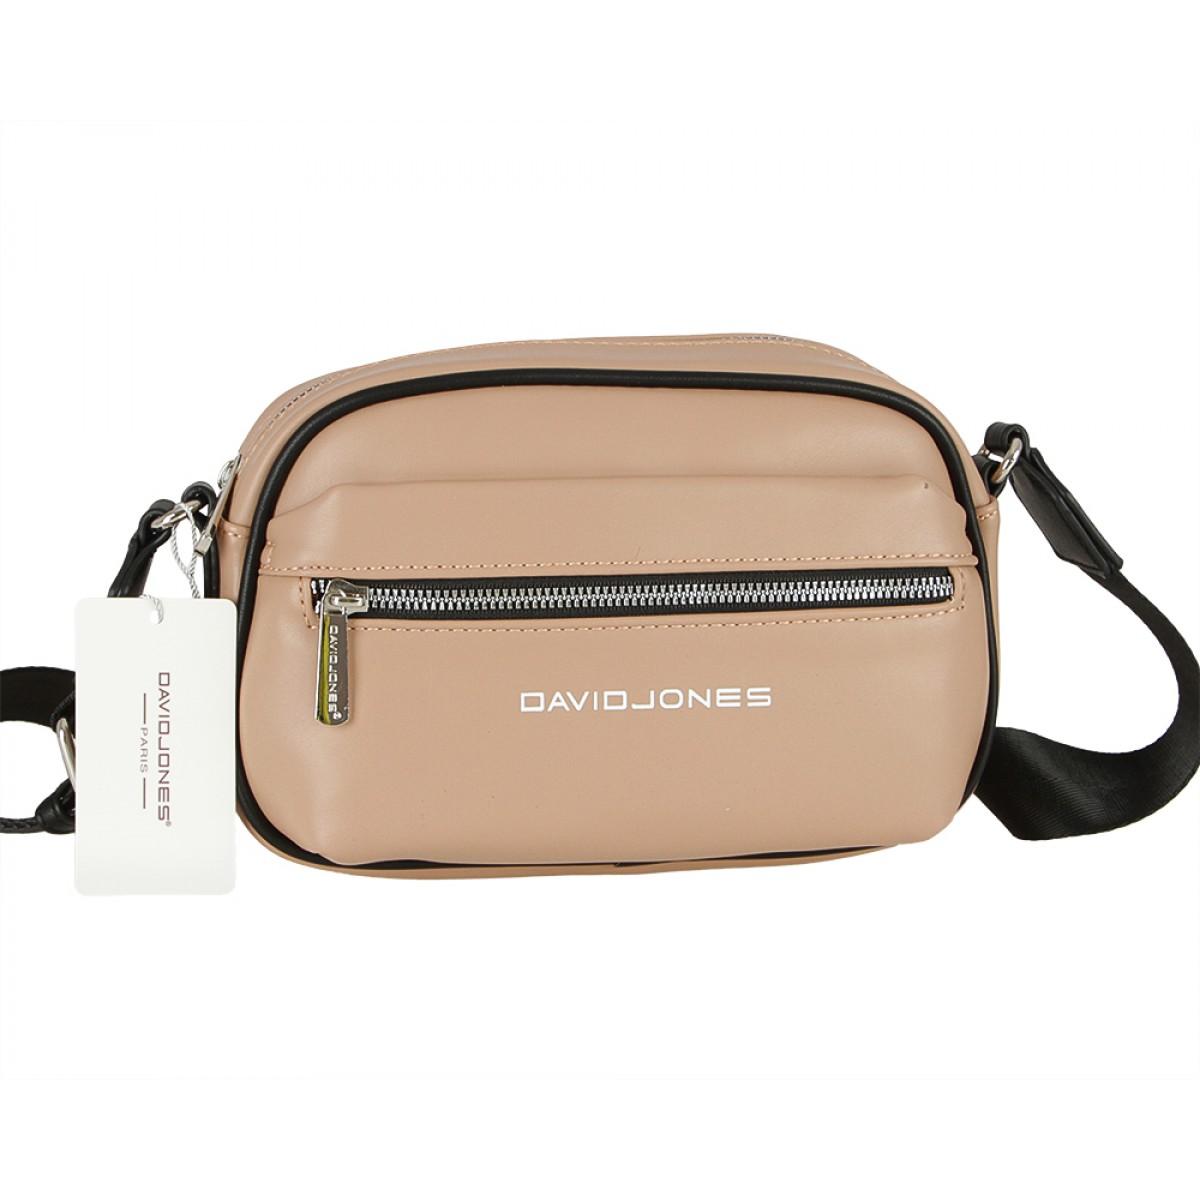 Жіноча сумка David Jones 6208-1 L.CAMEL